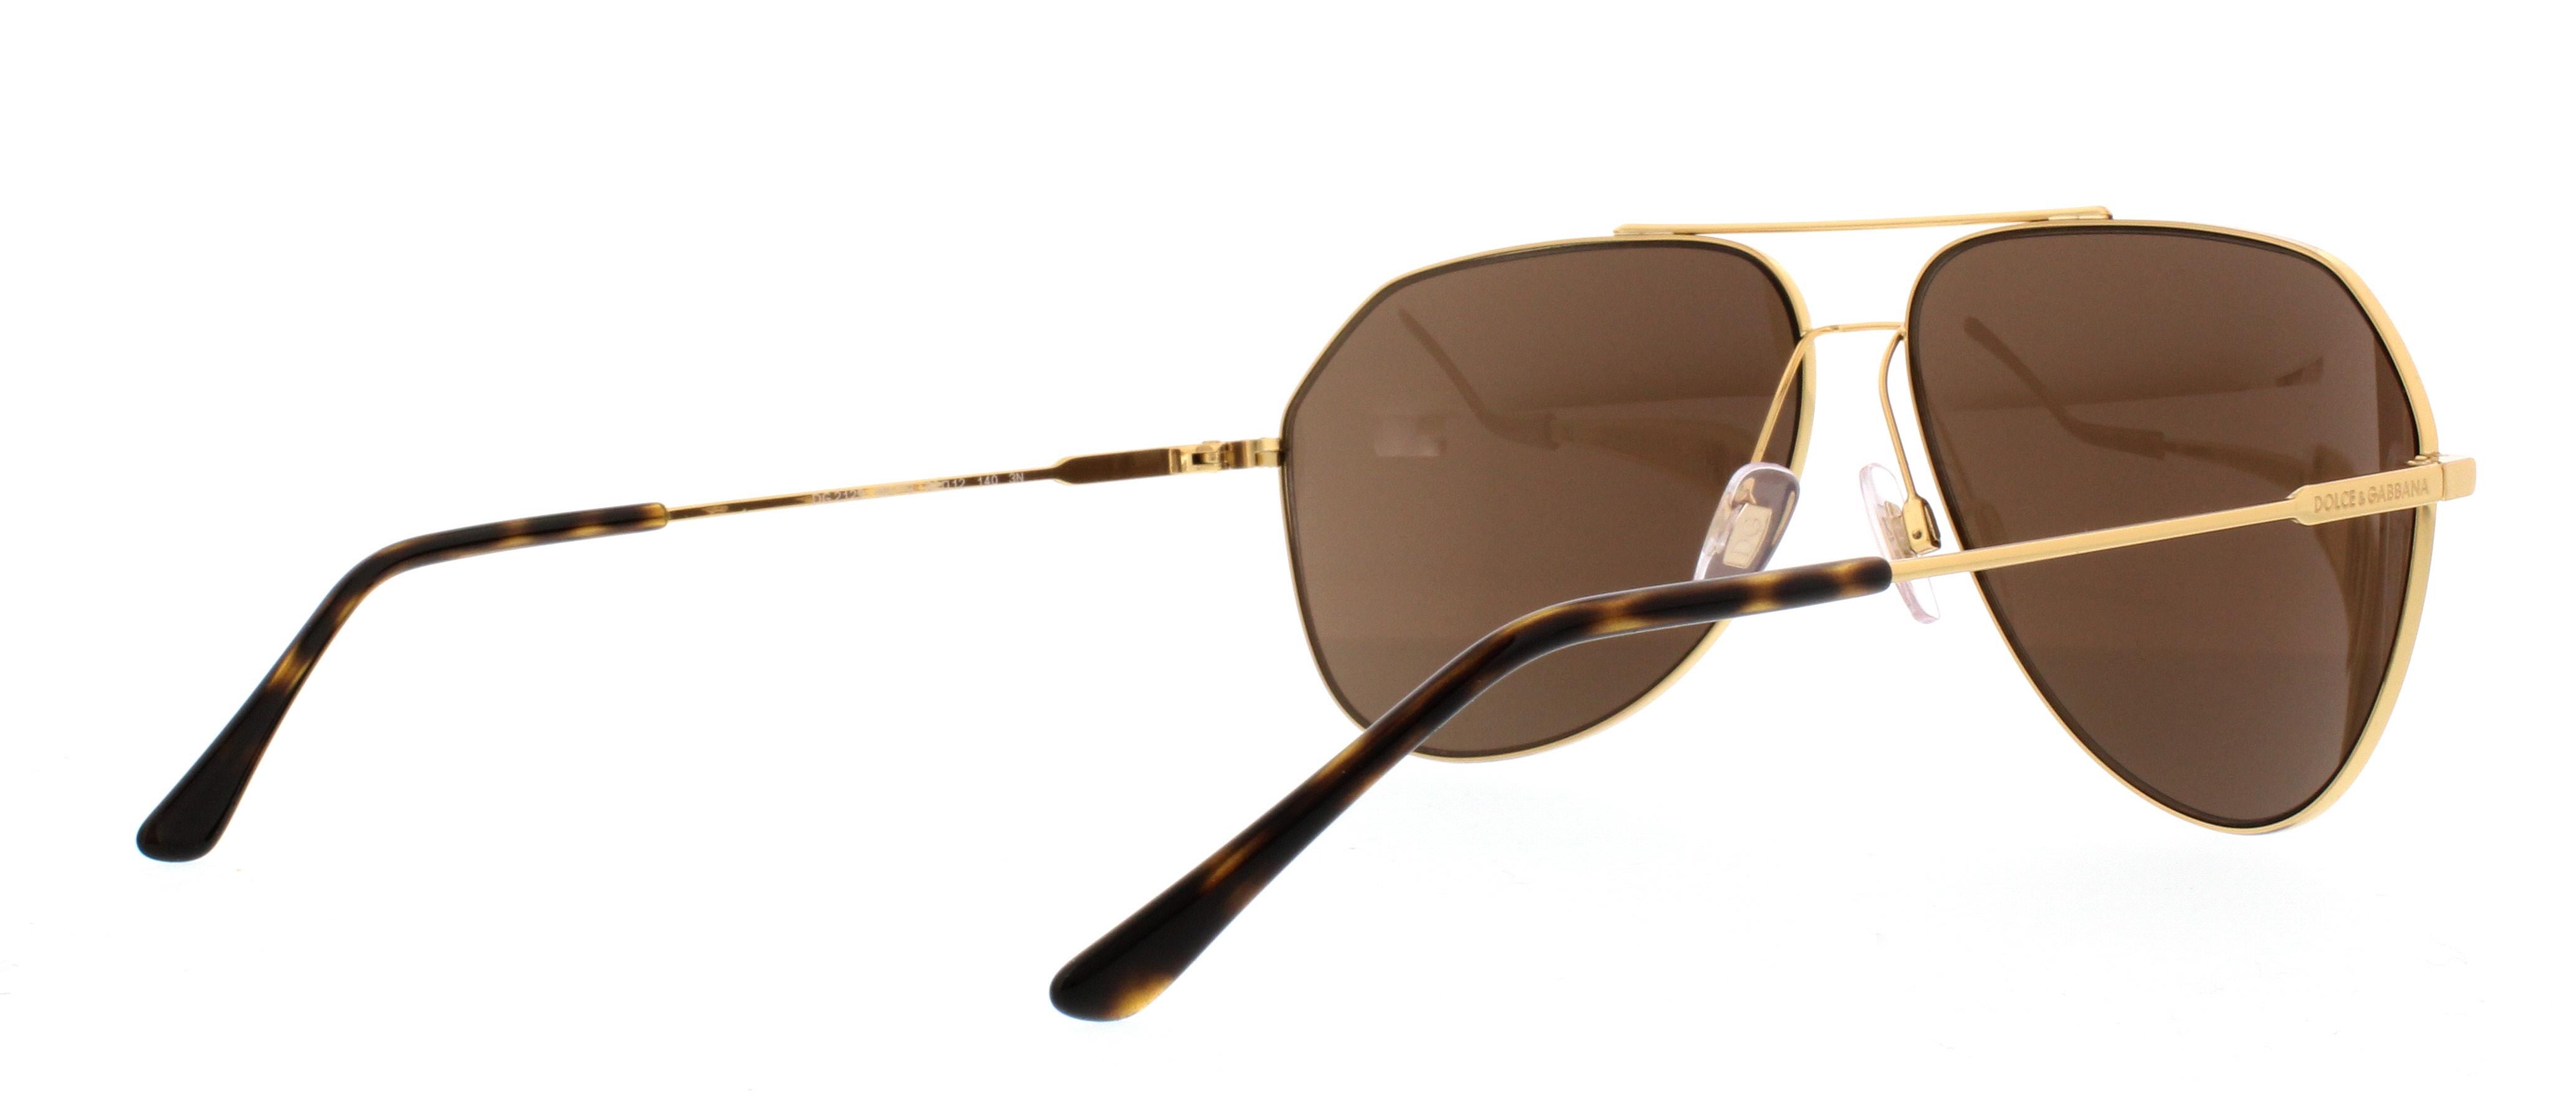 cca243e2c5 D G Dolce   Gabbana Men s 0DG4204 Aviator Sunglasses Black   Multilayer    Red 64 Source · Designer Frames Outlet Dolce   Gabbana DG2129